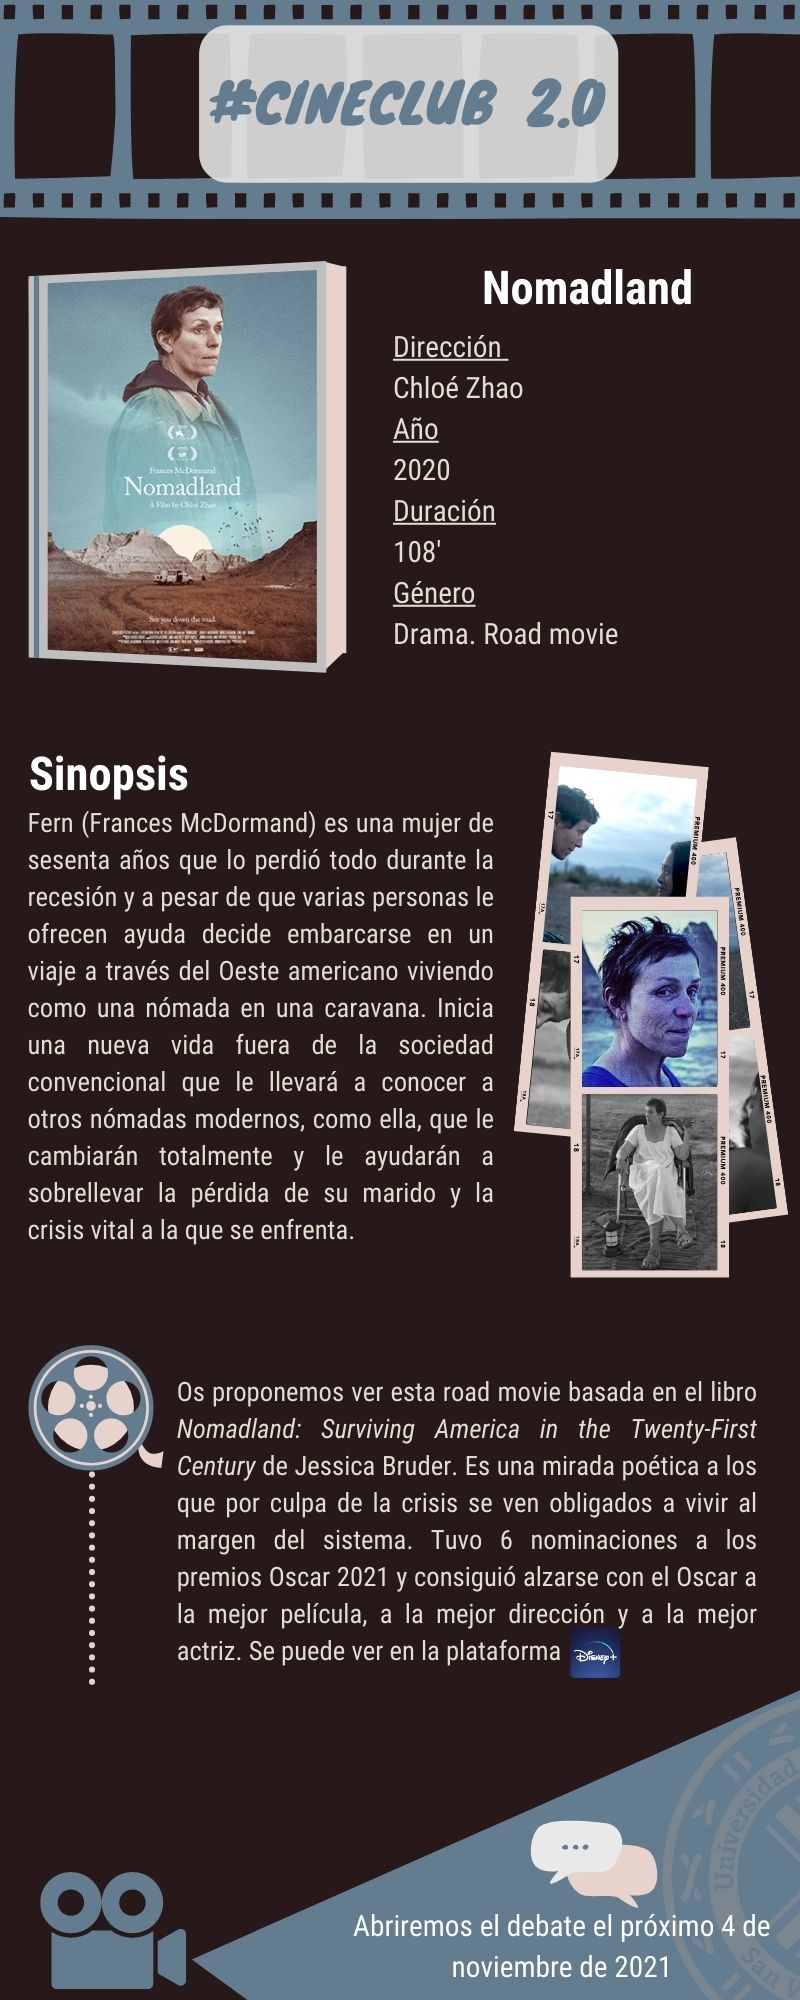 CineClub2.0 - Nomadland